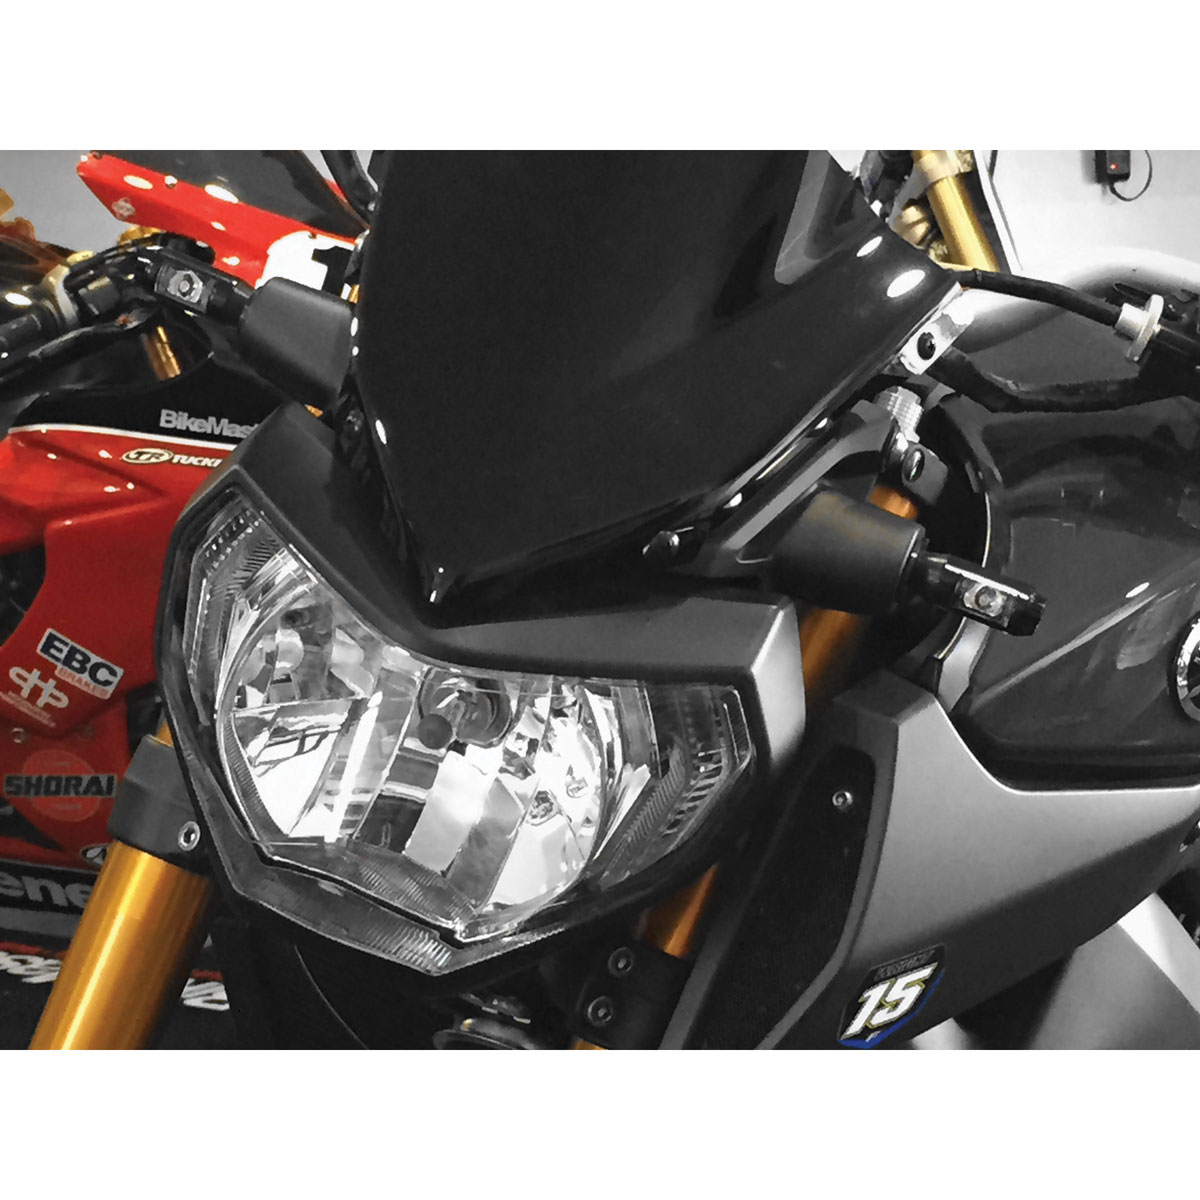 BikeMaster Gloss Black Snubnose Turn Signals with Resistors